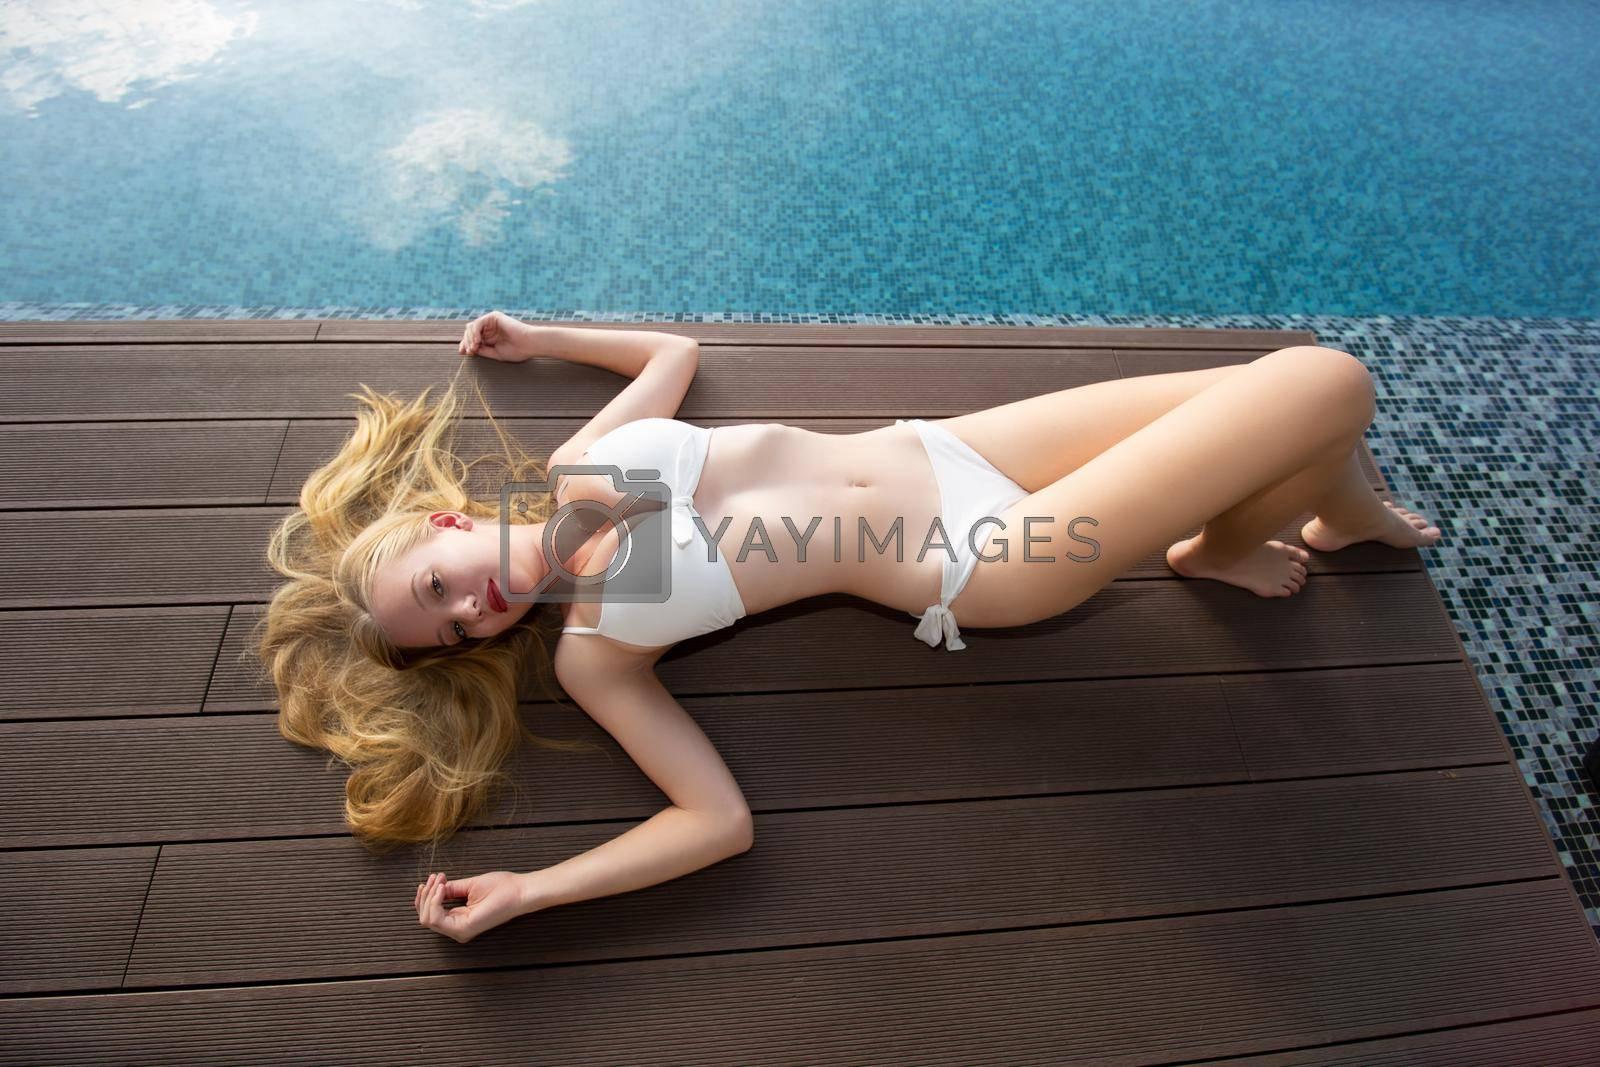 Young woman enjoying a sun, Slim young girl model in white bikini  by the pool.